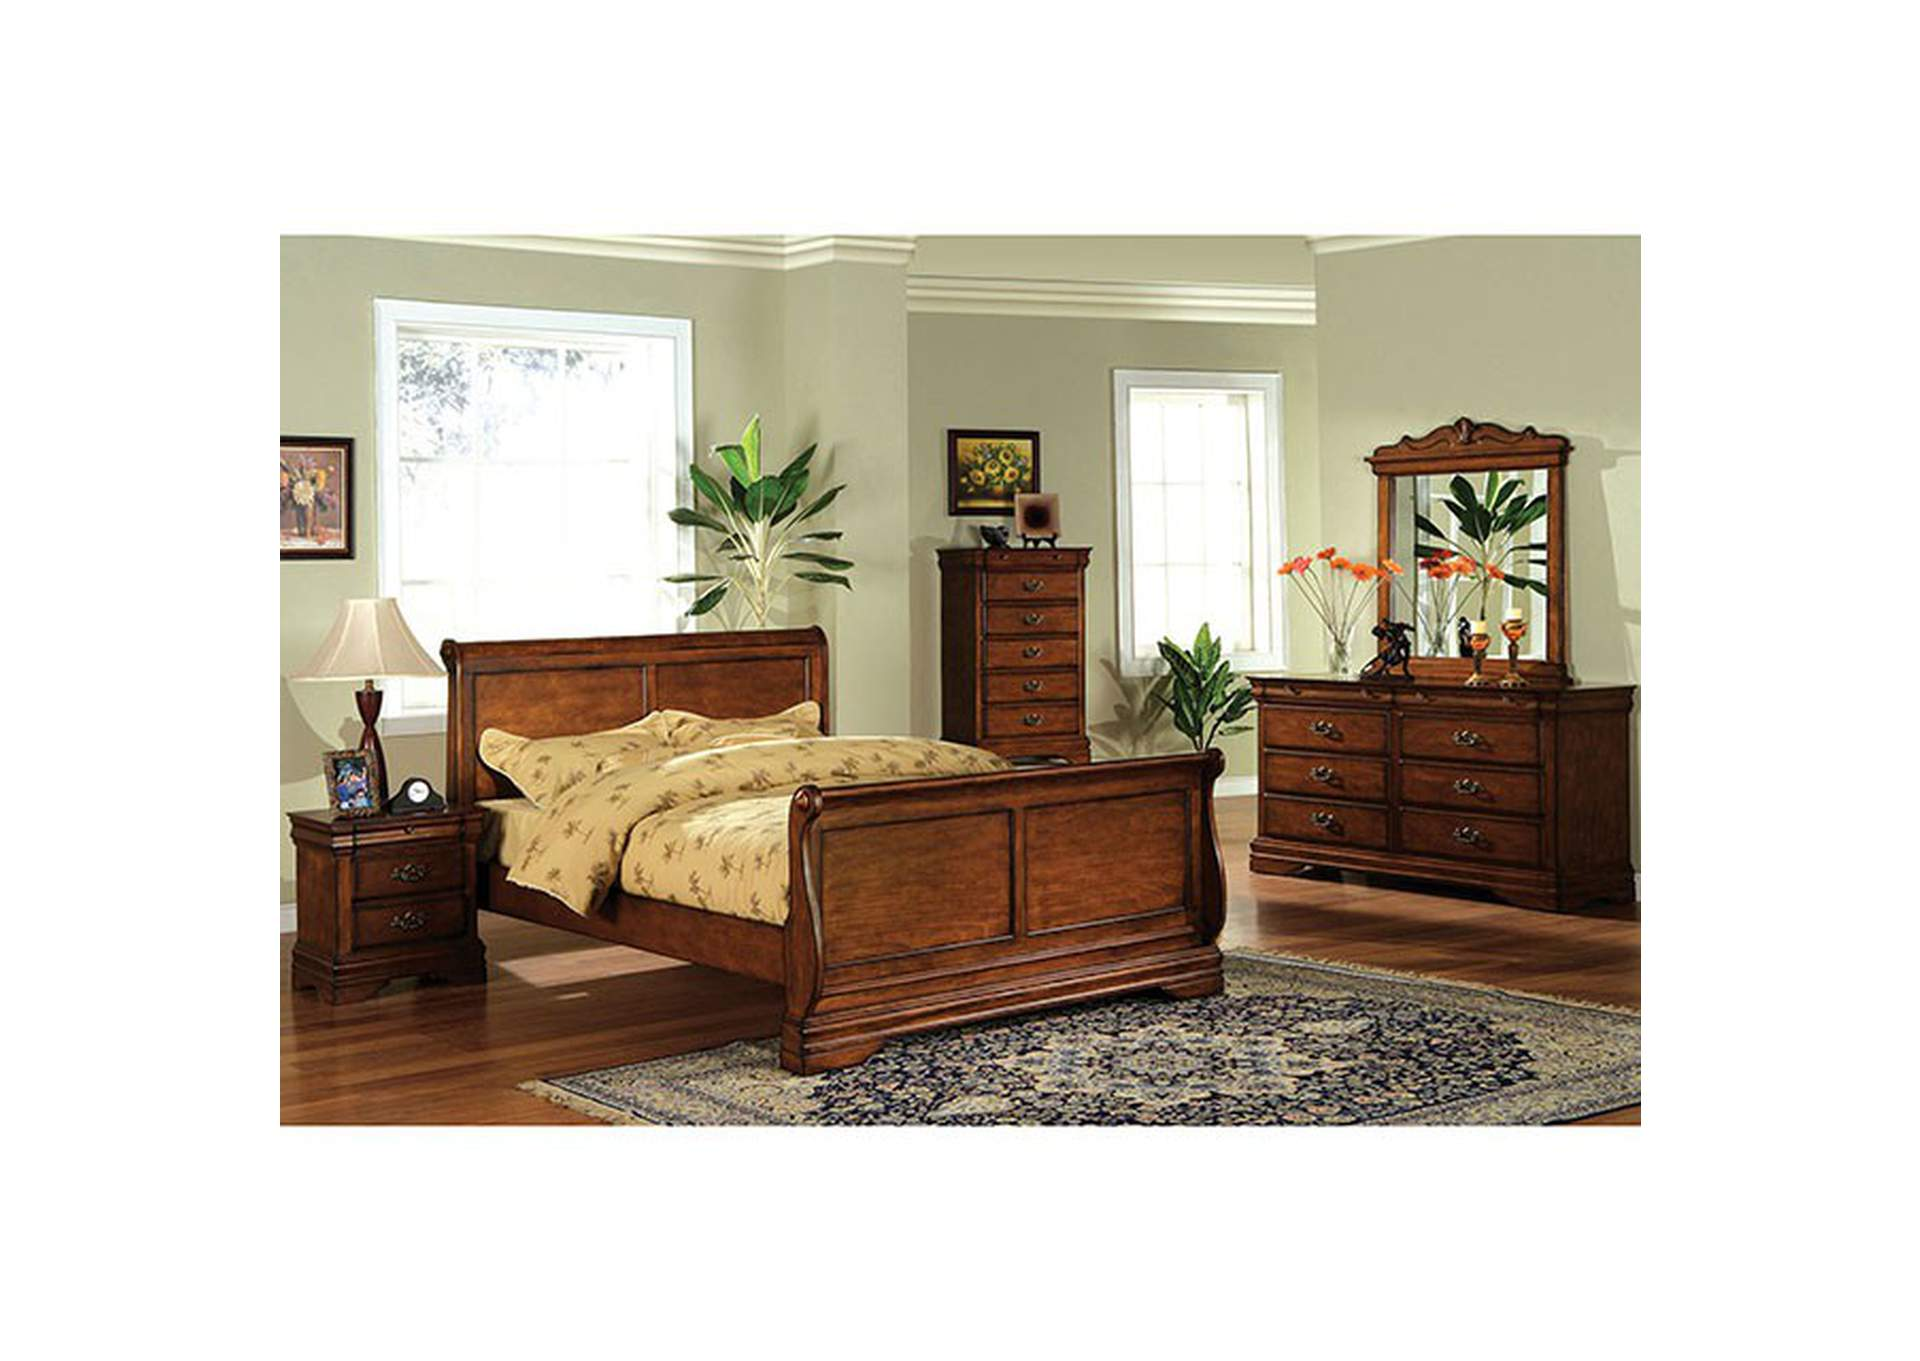 Venice California King Sleigh Bed Quality Rugs Home Furnishings Federal Way Wa